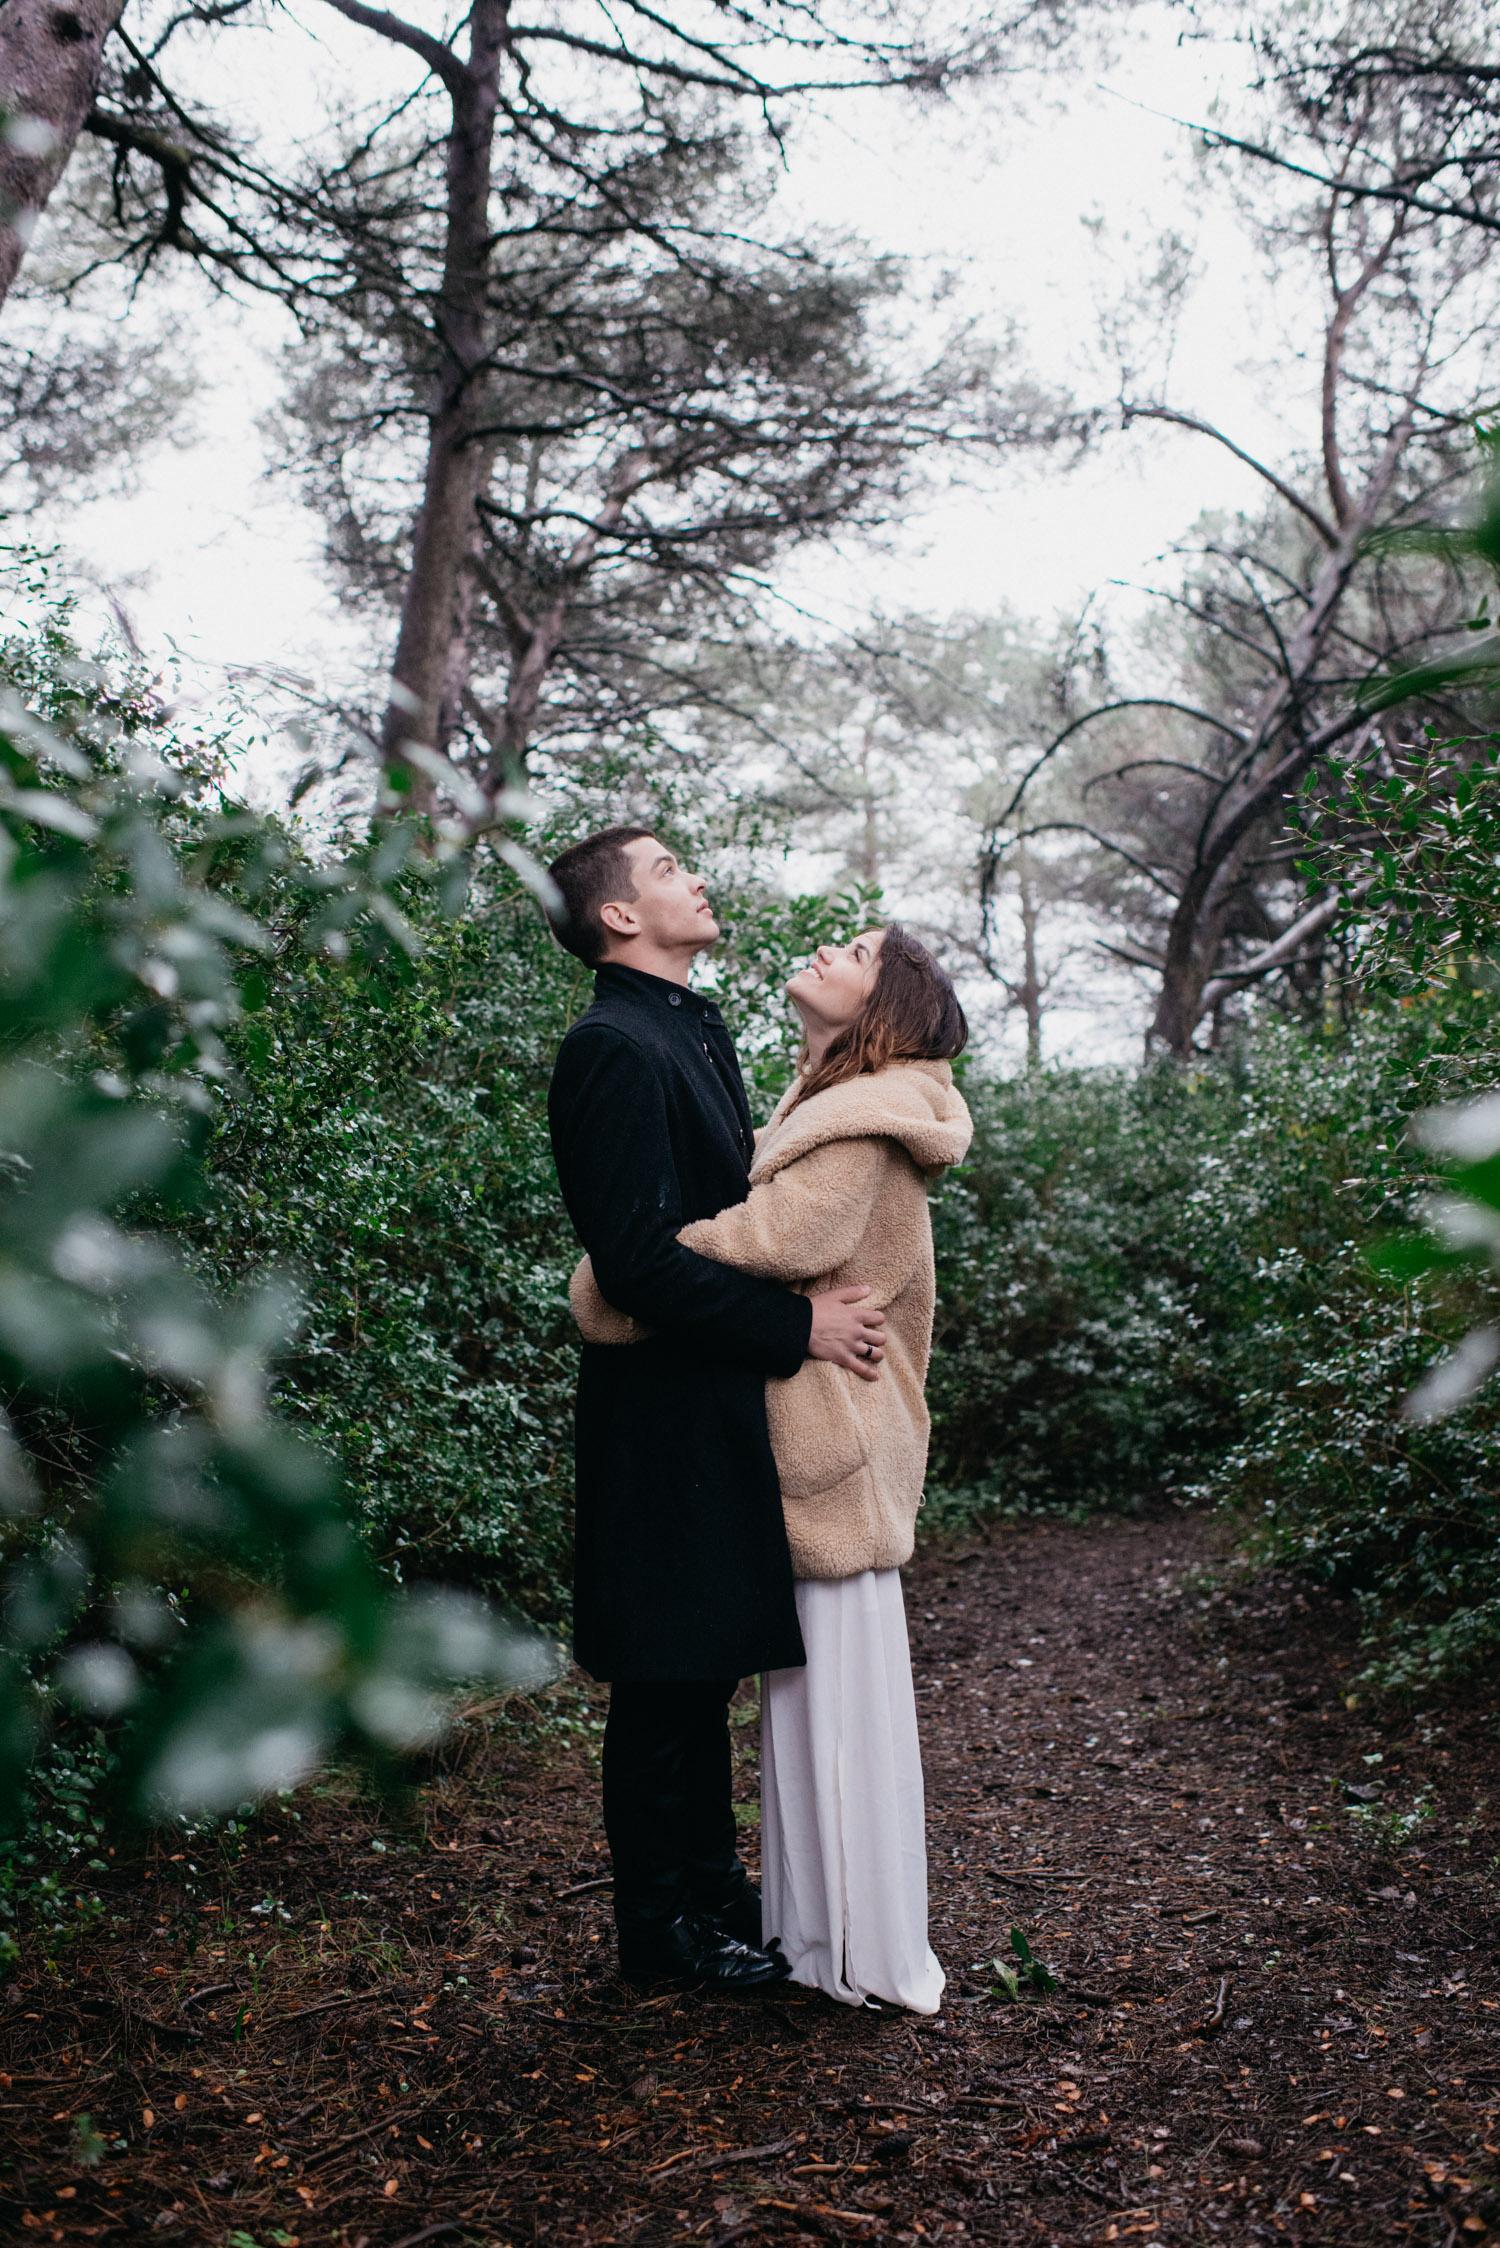 katarina-rui-wewillweddings-lisboa-weddingphotography-portugal-hochzeitsfotografin-wien-__sterreich-vienna-austria-14 Be my Valentine... Couple Shooting